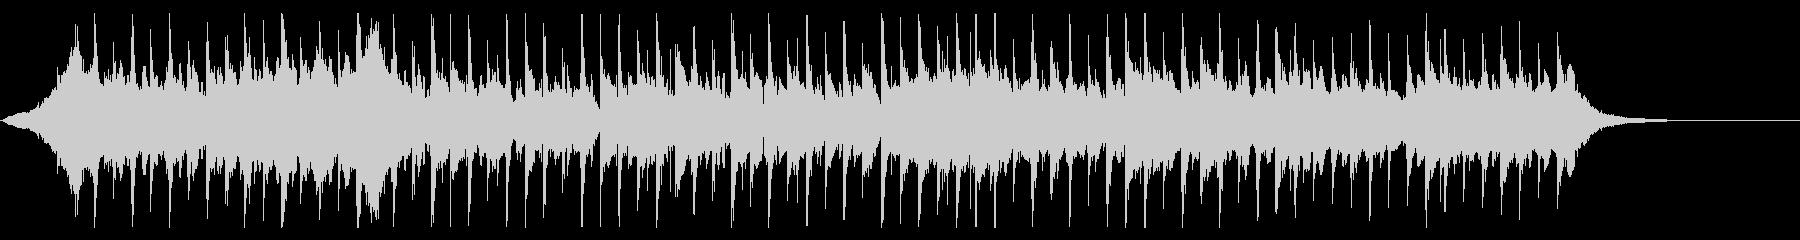 bgm39の未再生の波形